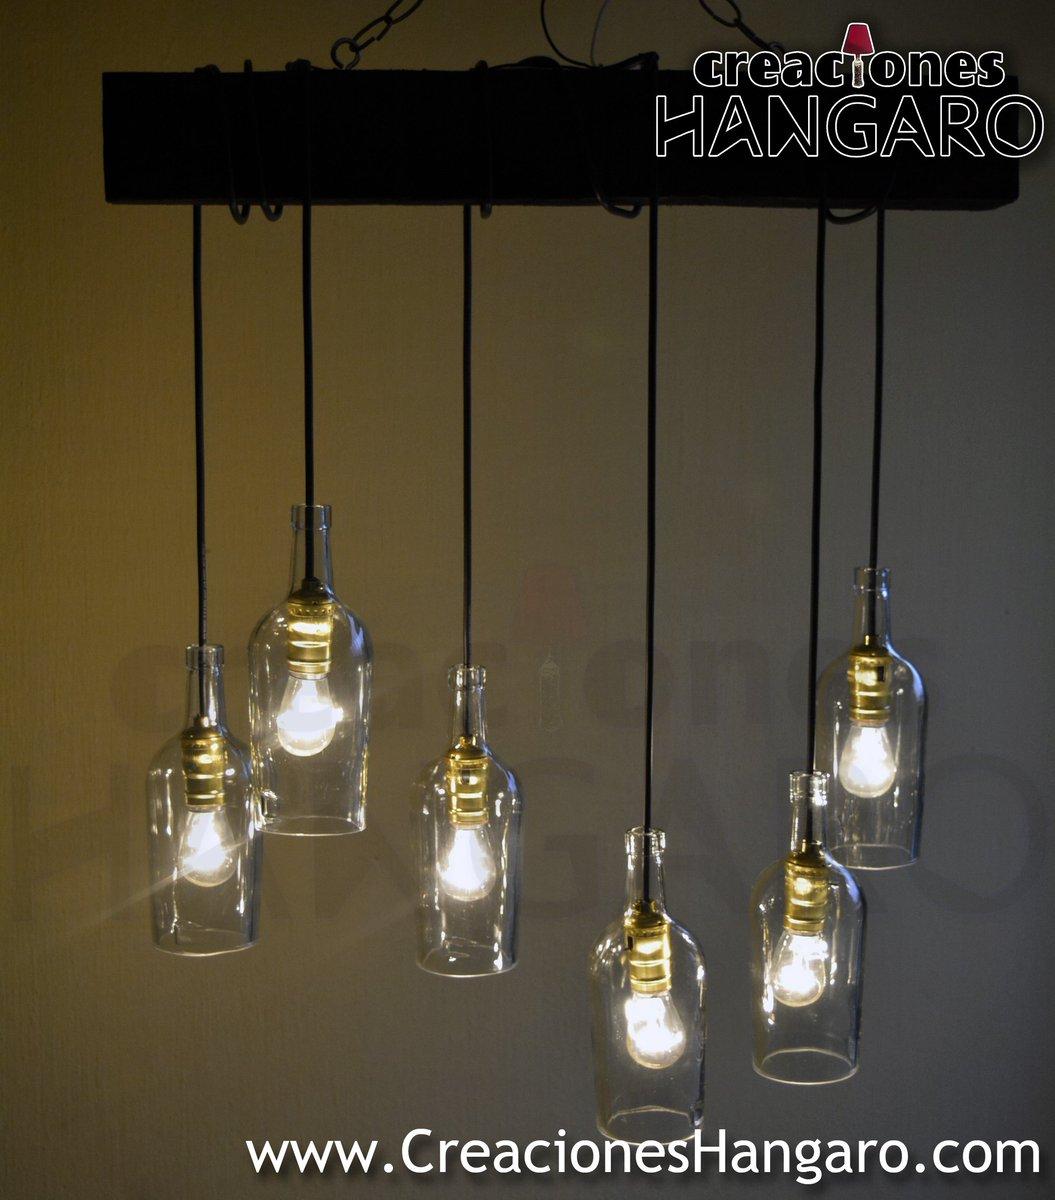 on Lamparas Hangaro Hangaro Lamparas on Lamparas Twitter Twitter rdCxoQWBe